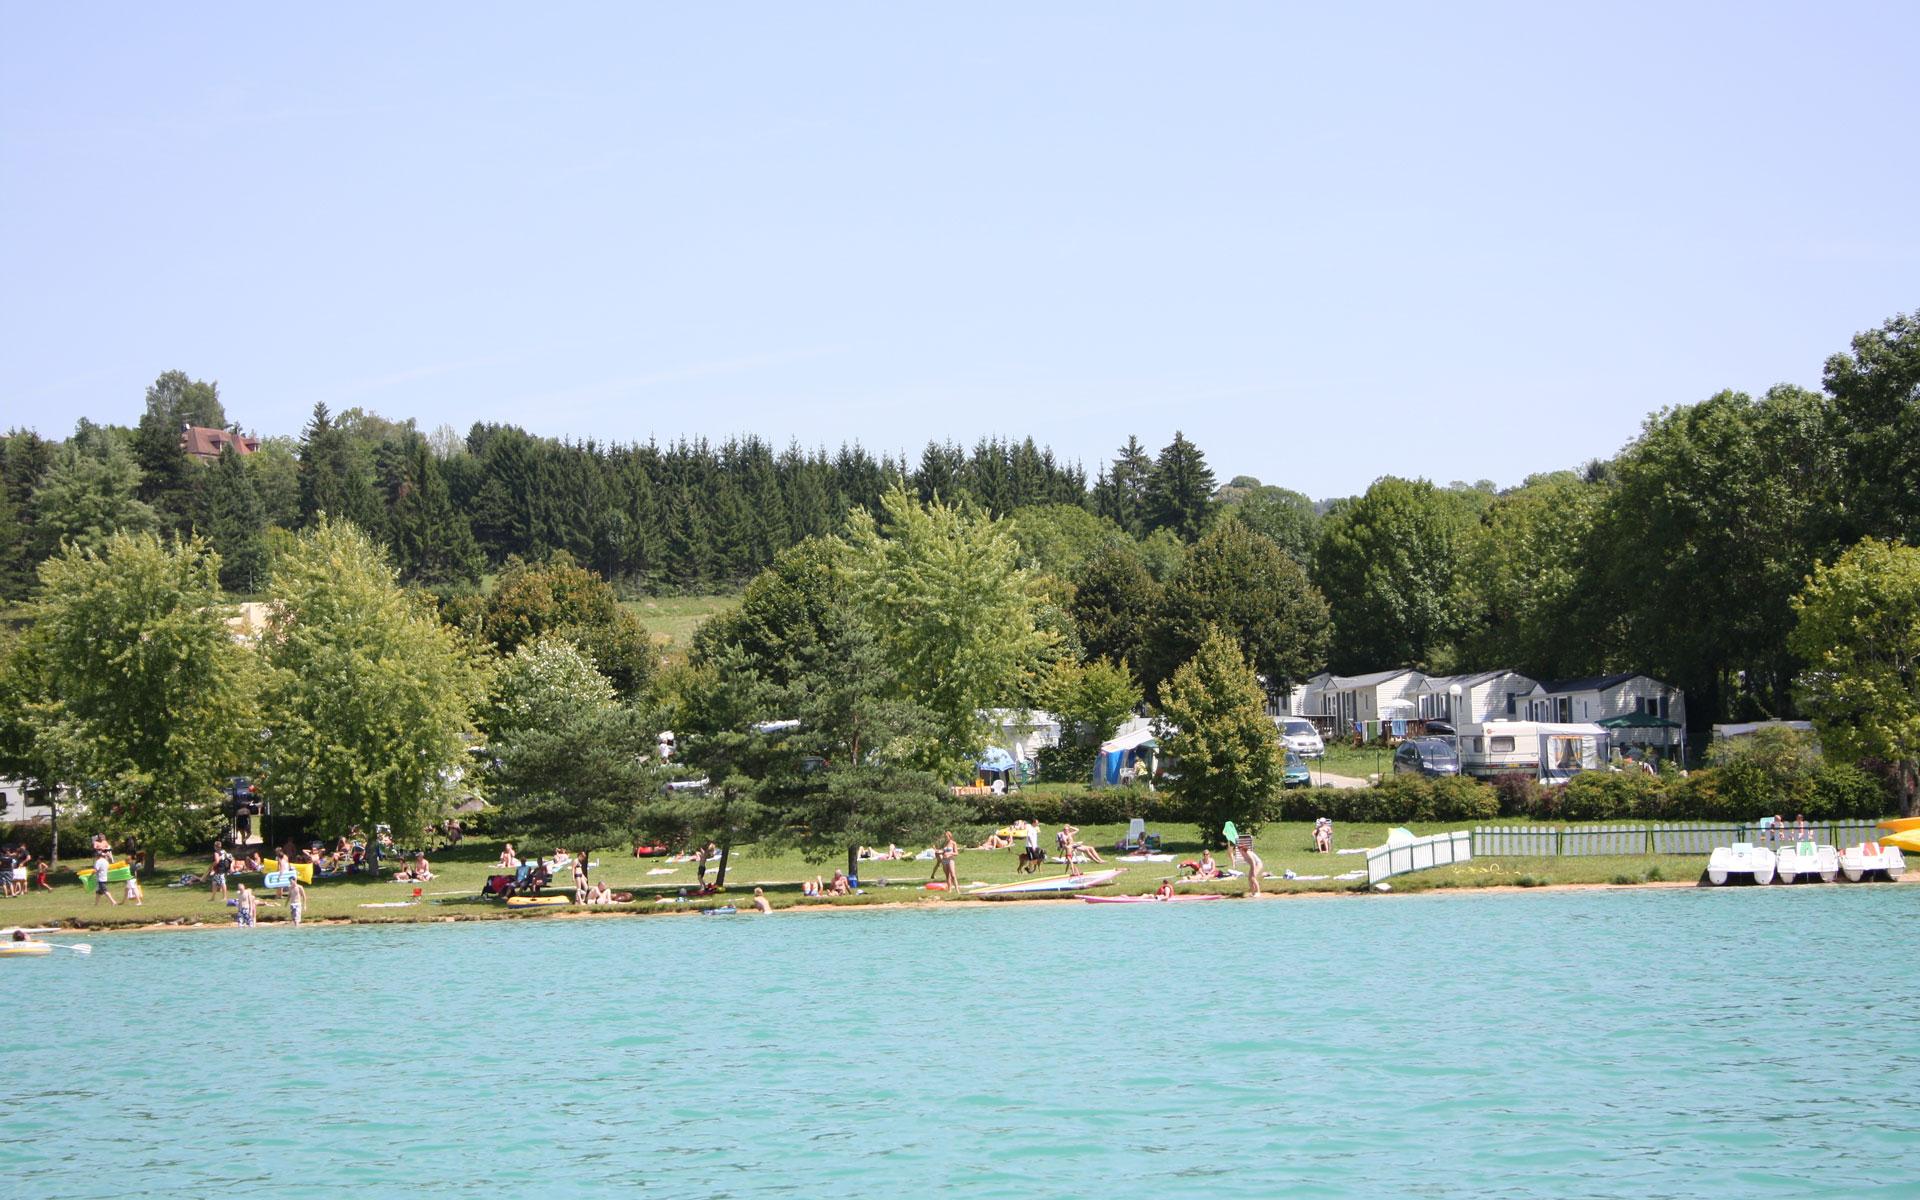 Camping Jura Avec Piscine | 3 Étoiles | Lac De Clairvaux ... serapportantà Camping Jura Piscine